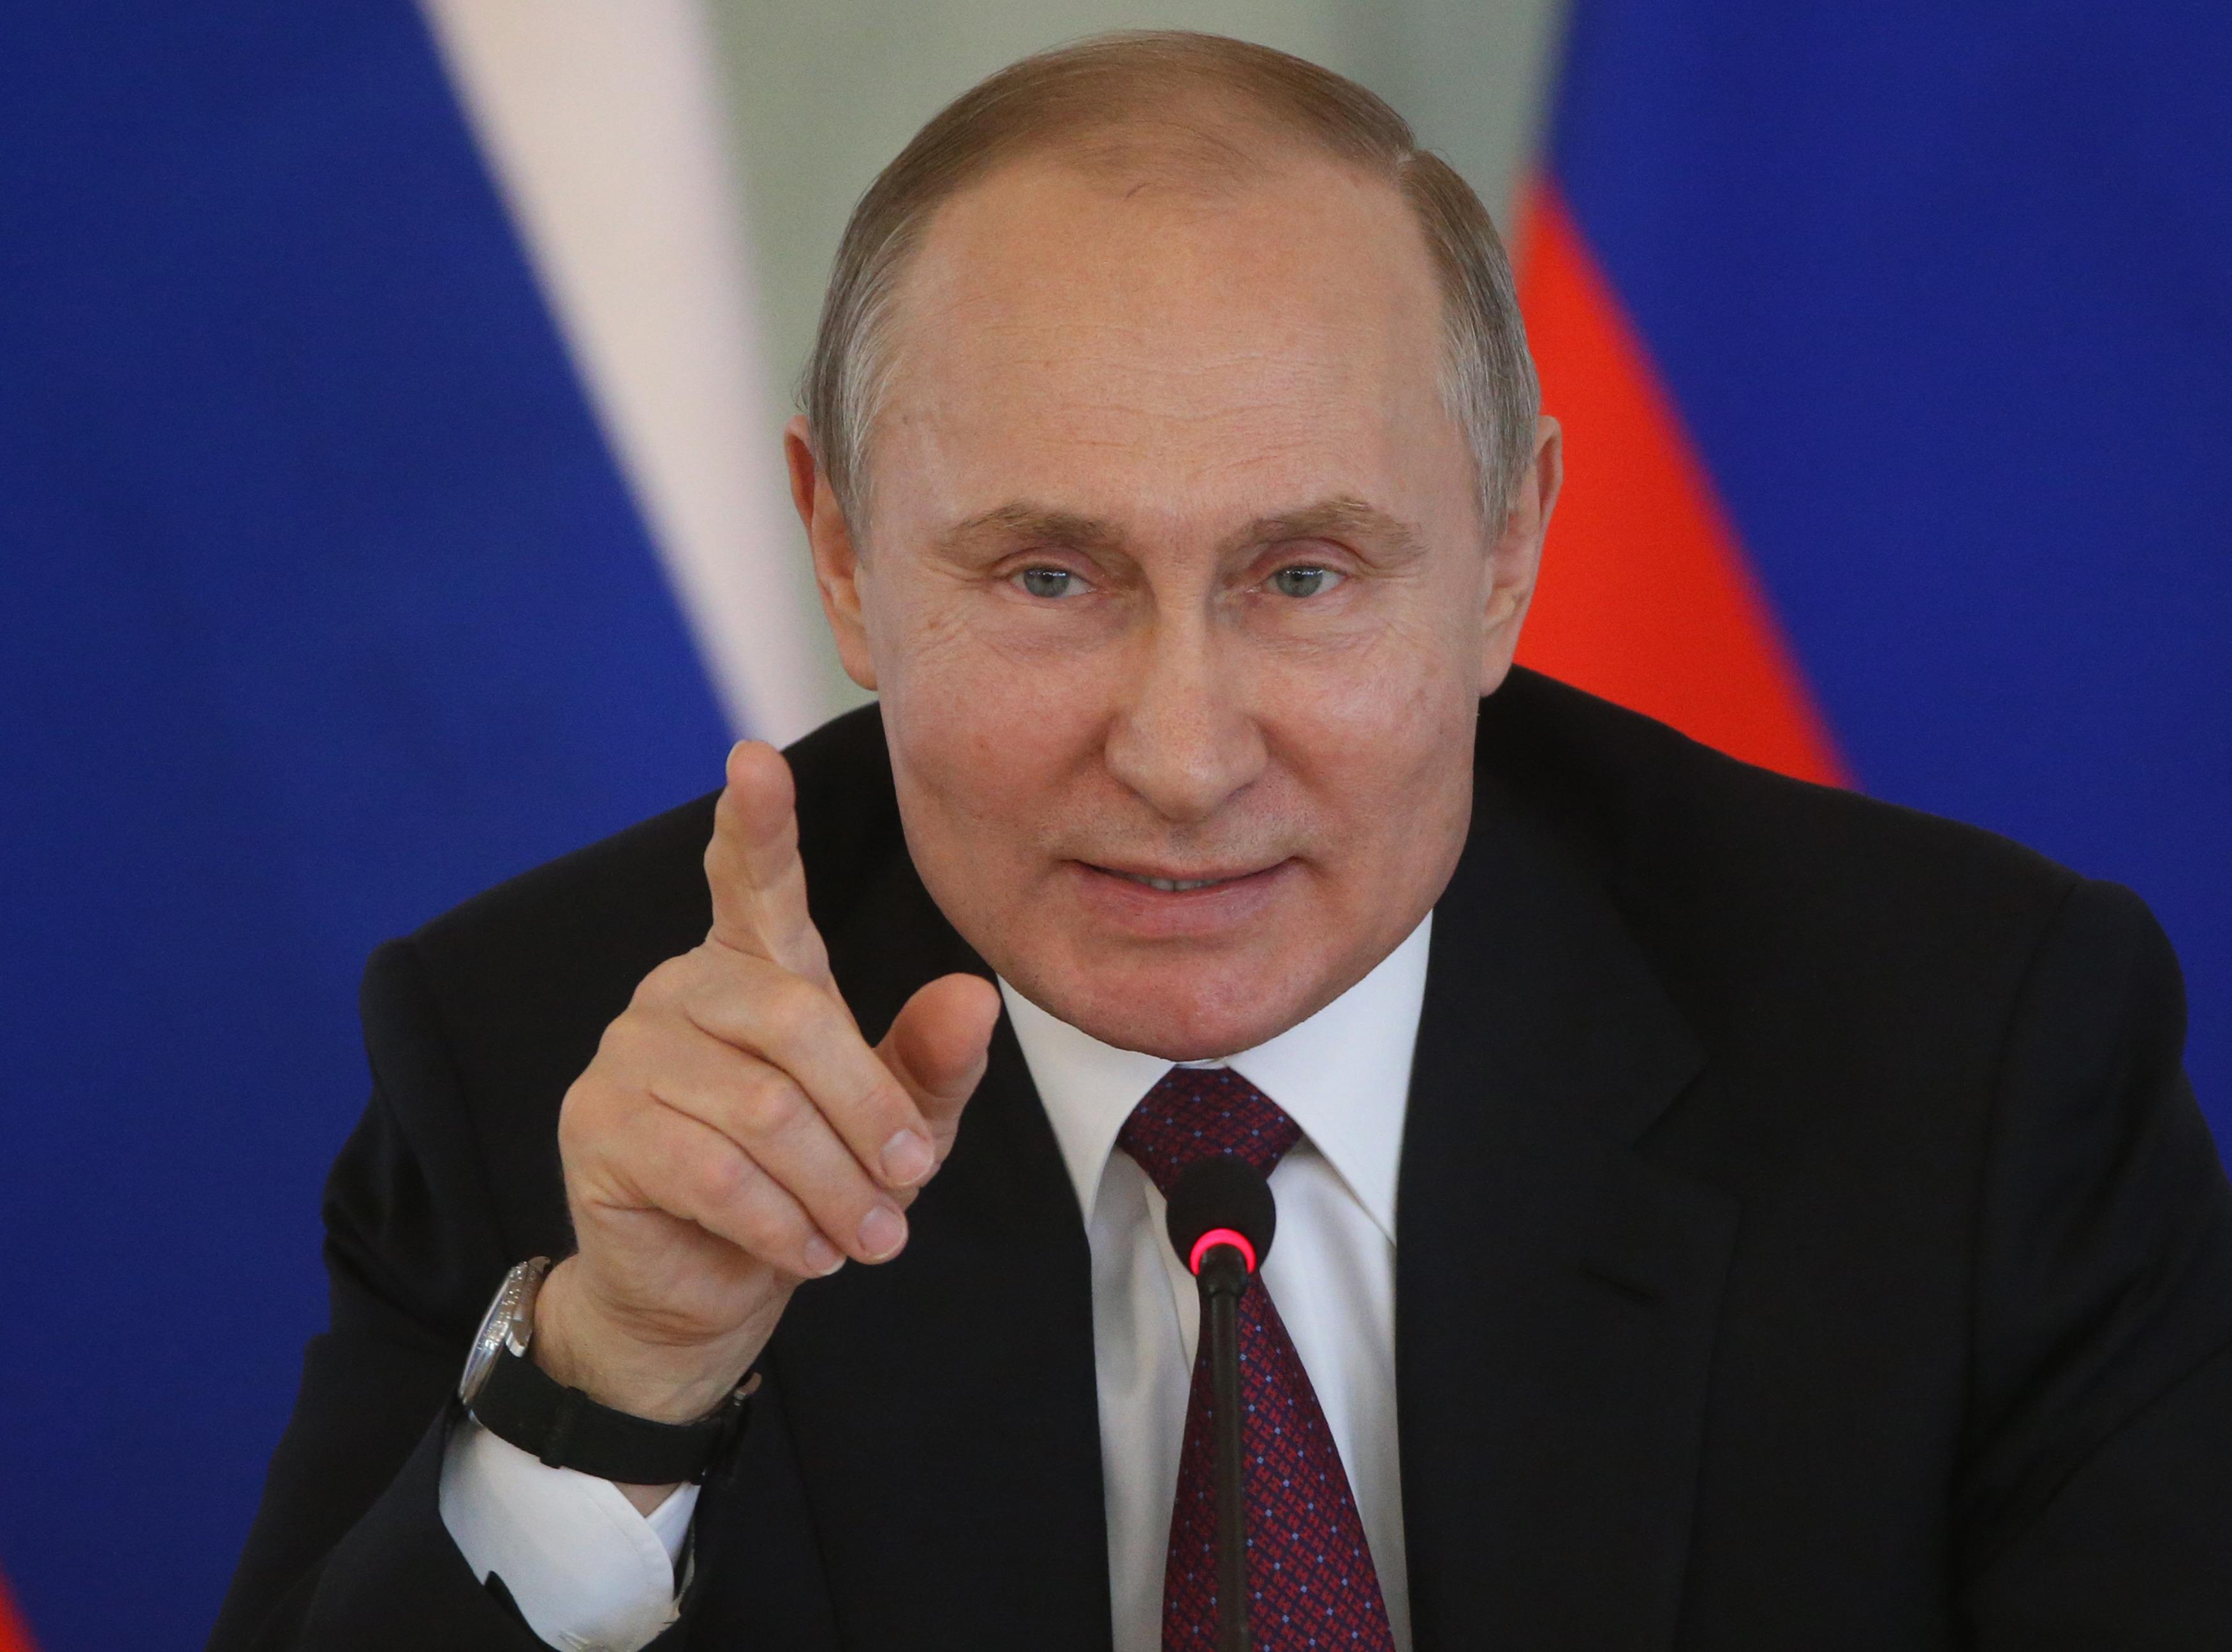 Russian President Vladimir Putin visits Saint Petersburg